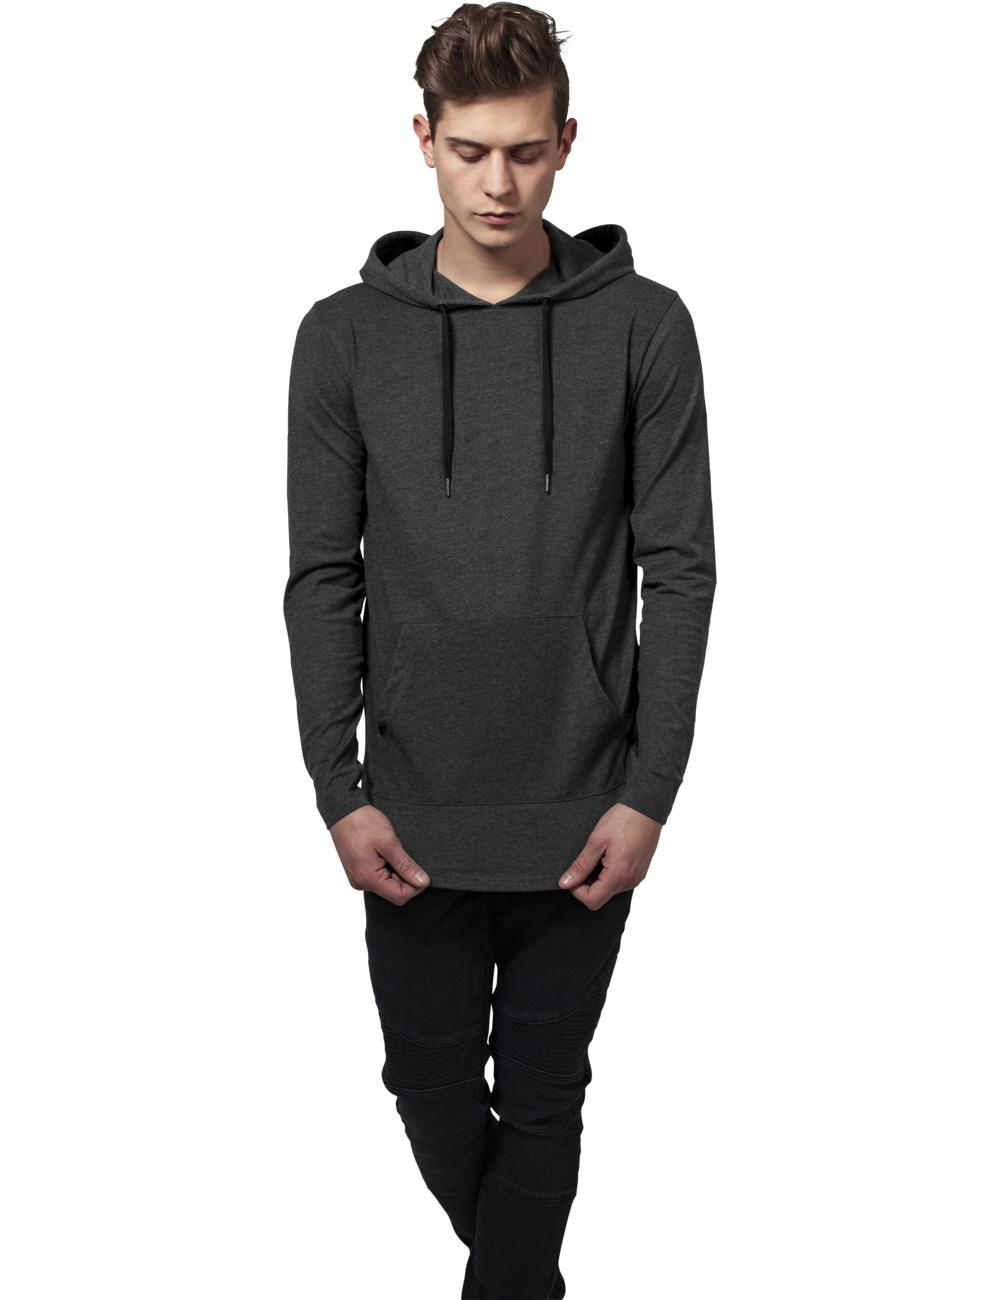 Urban Classics Herren Kapuzensweater Jersey Hoody XL, Charcoal (091)